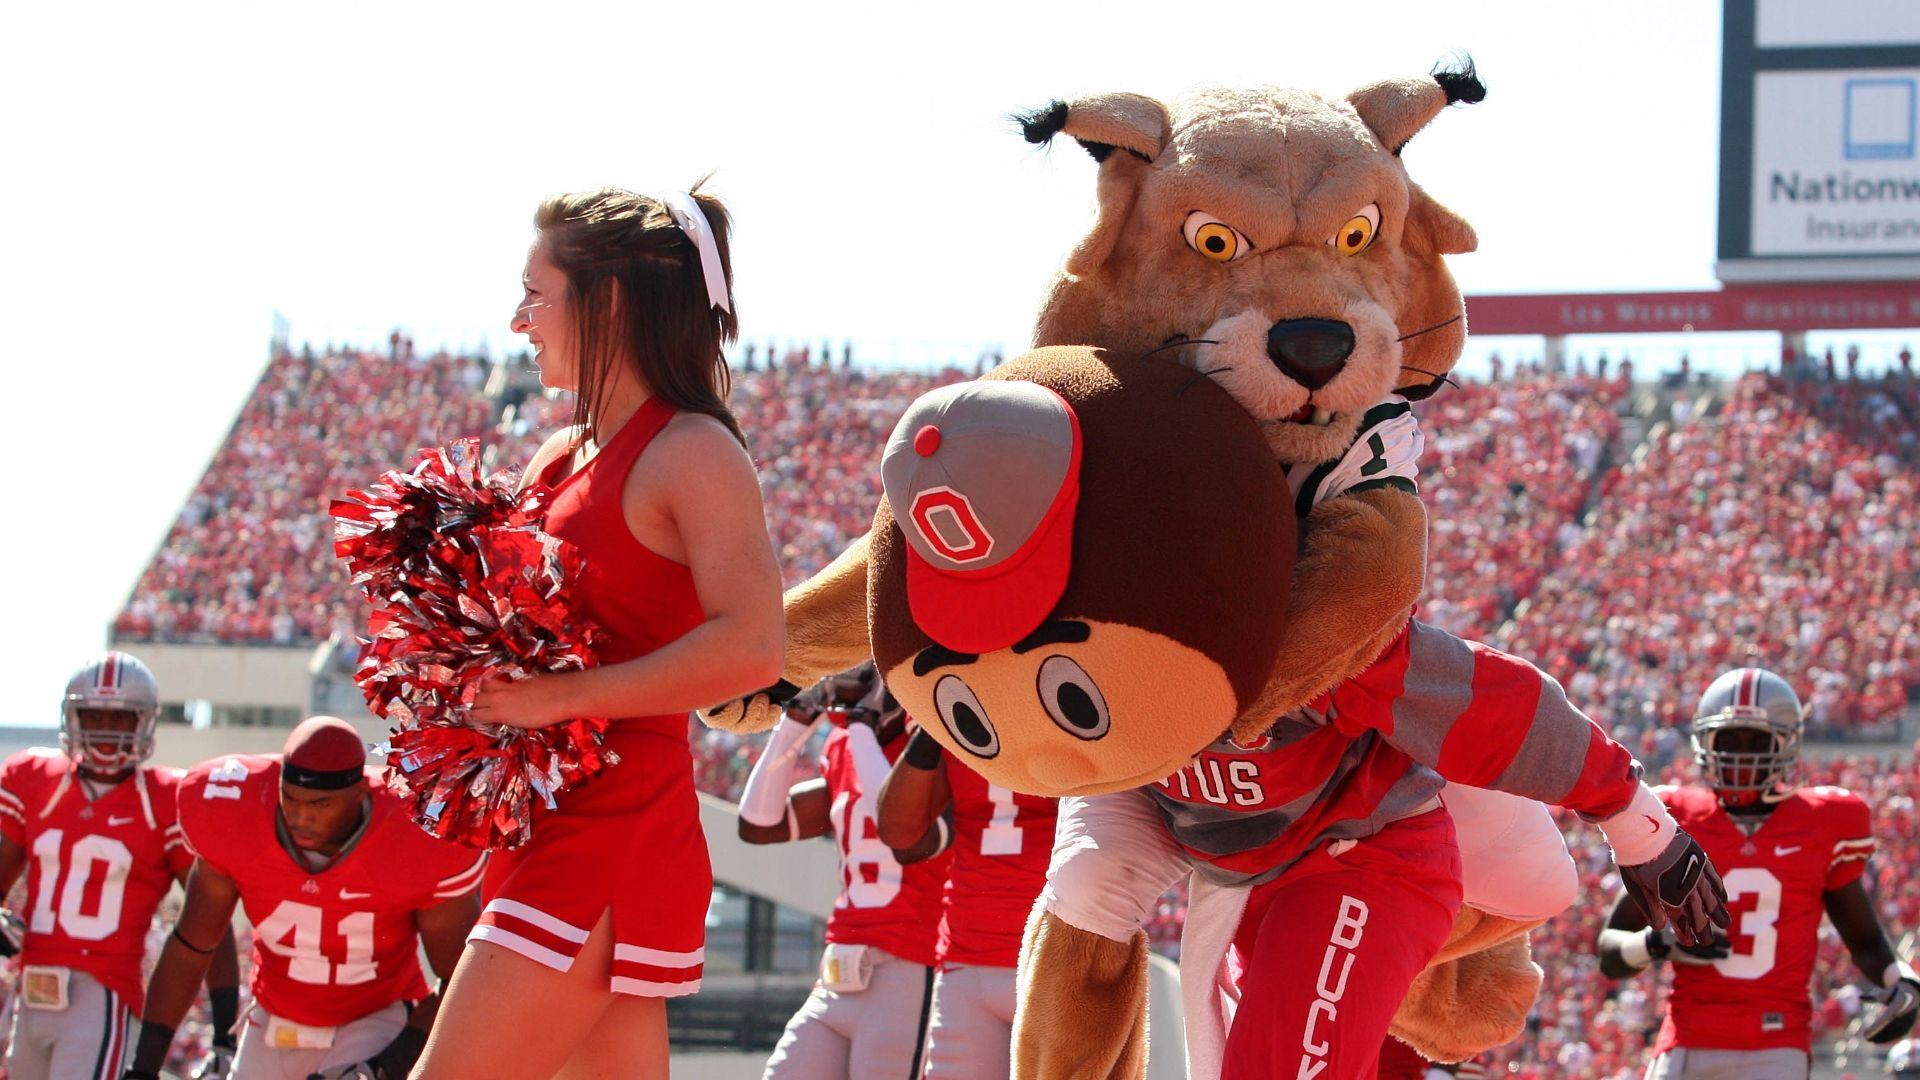 The true story behind the Ohio mascot attack on Brutus Buckeye - ESPN Video